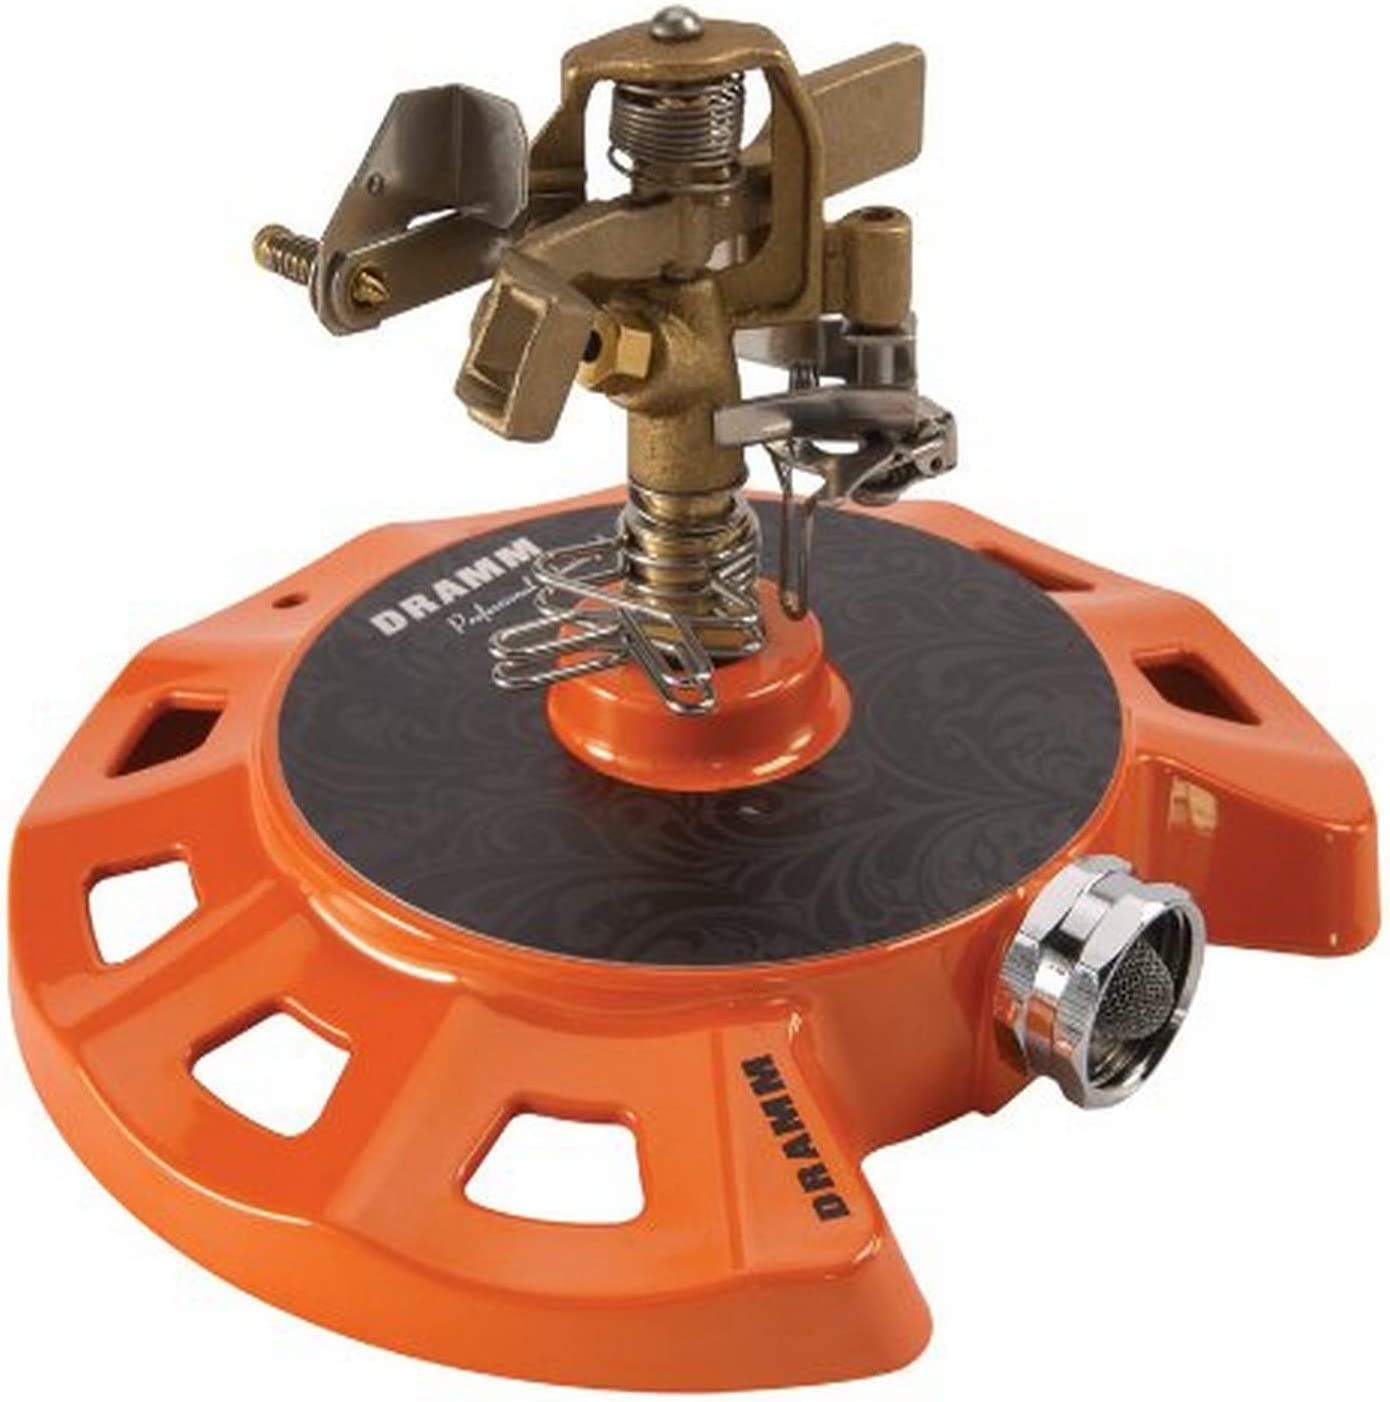 Dramm 15082 Circular Base Impulse Sprinkler with a Heavy-Duty Metal Base, Orange